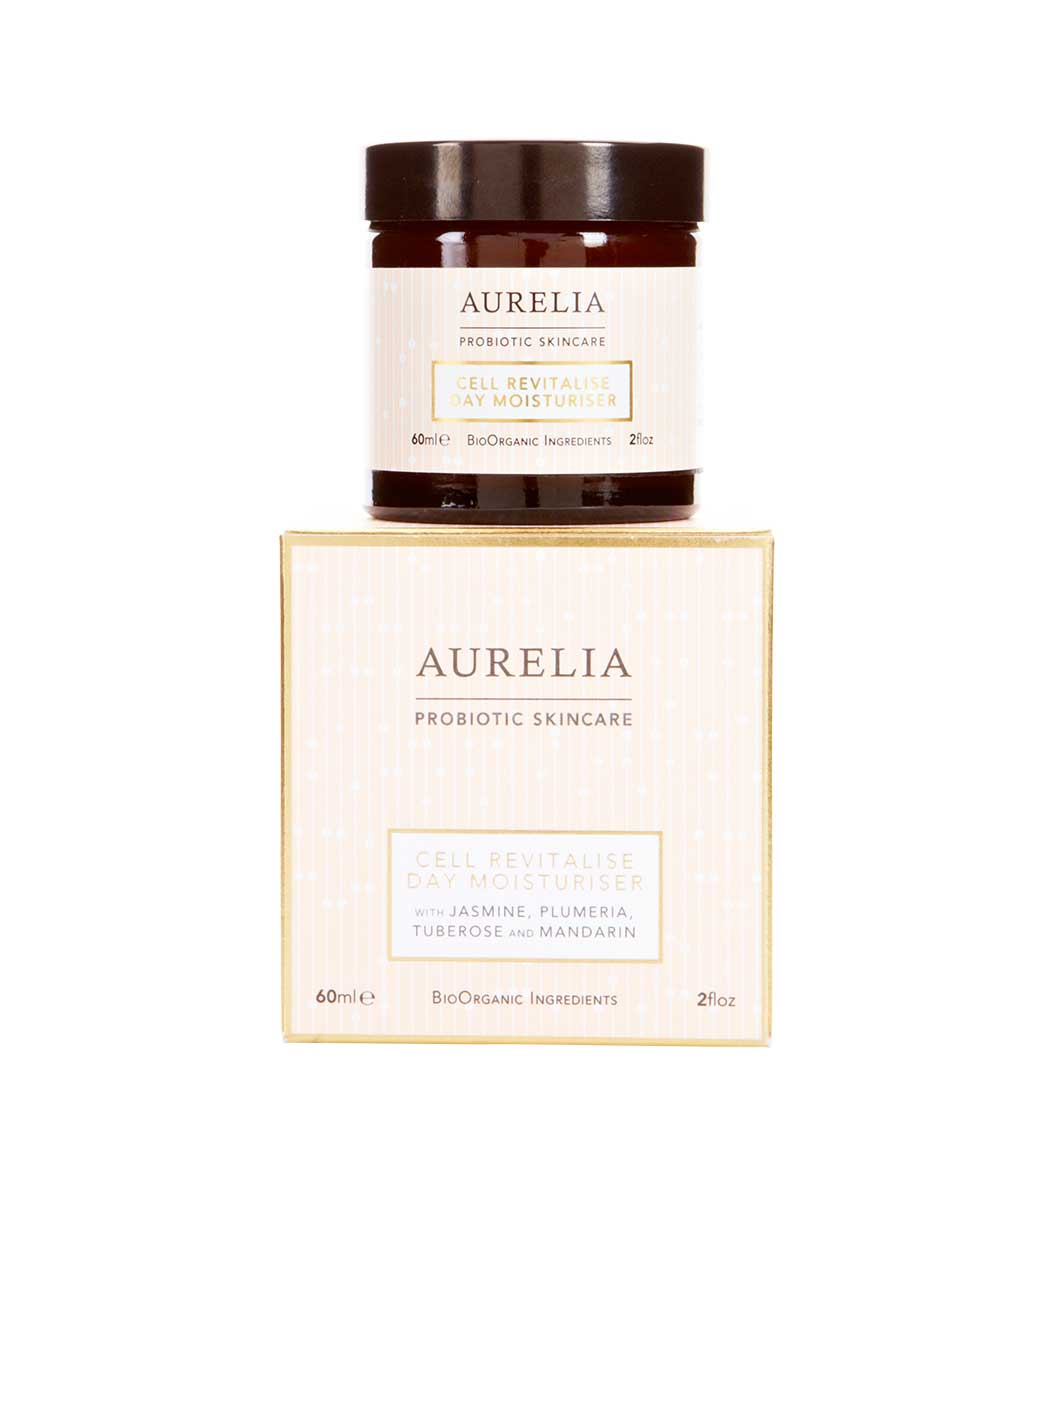 Cell Revitalise Day Moisturiser, £42, Aurelia Skincare. www.aureliaskincare.com